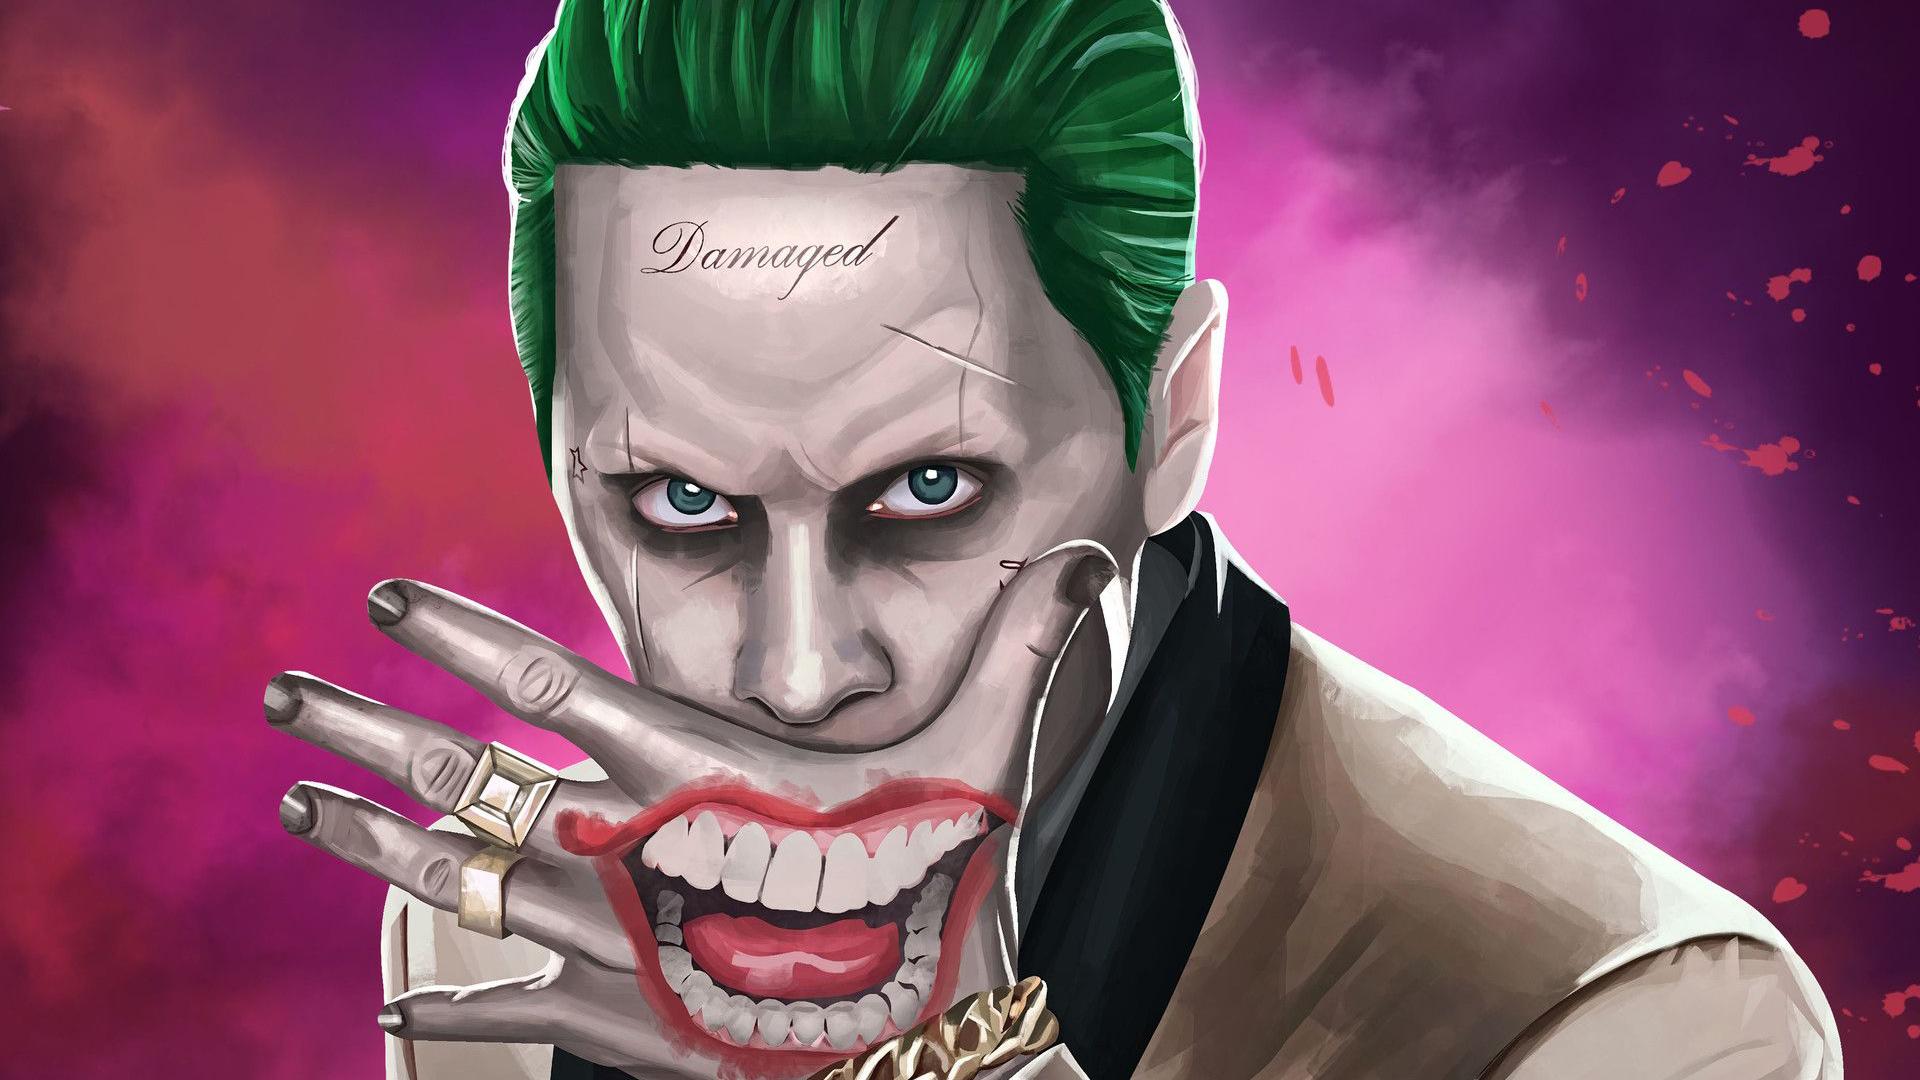 Joker Jared Leto Art Hd Superheroes 4k Wallpapers Images